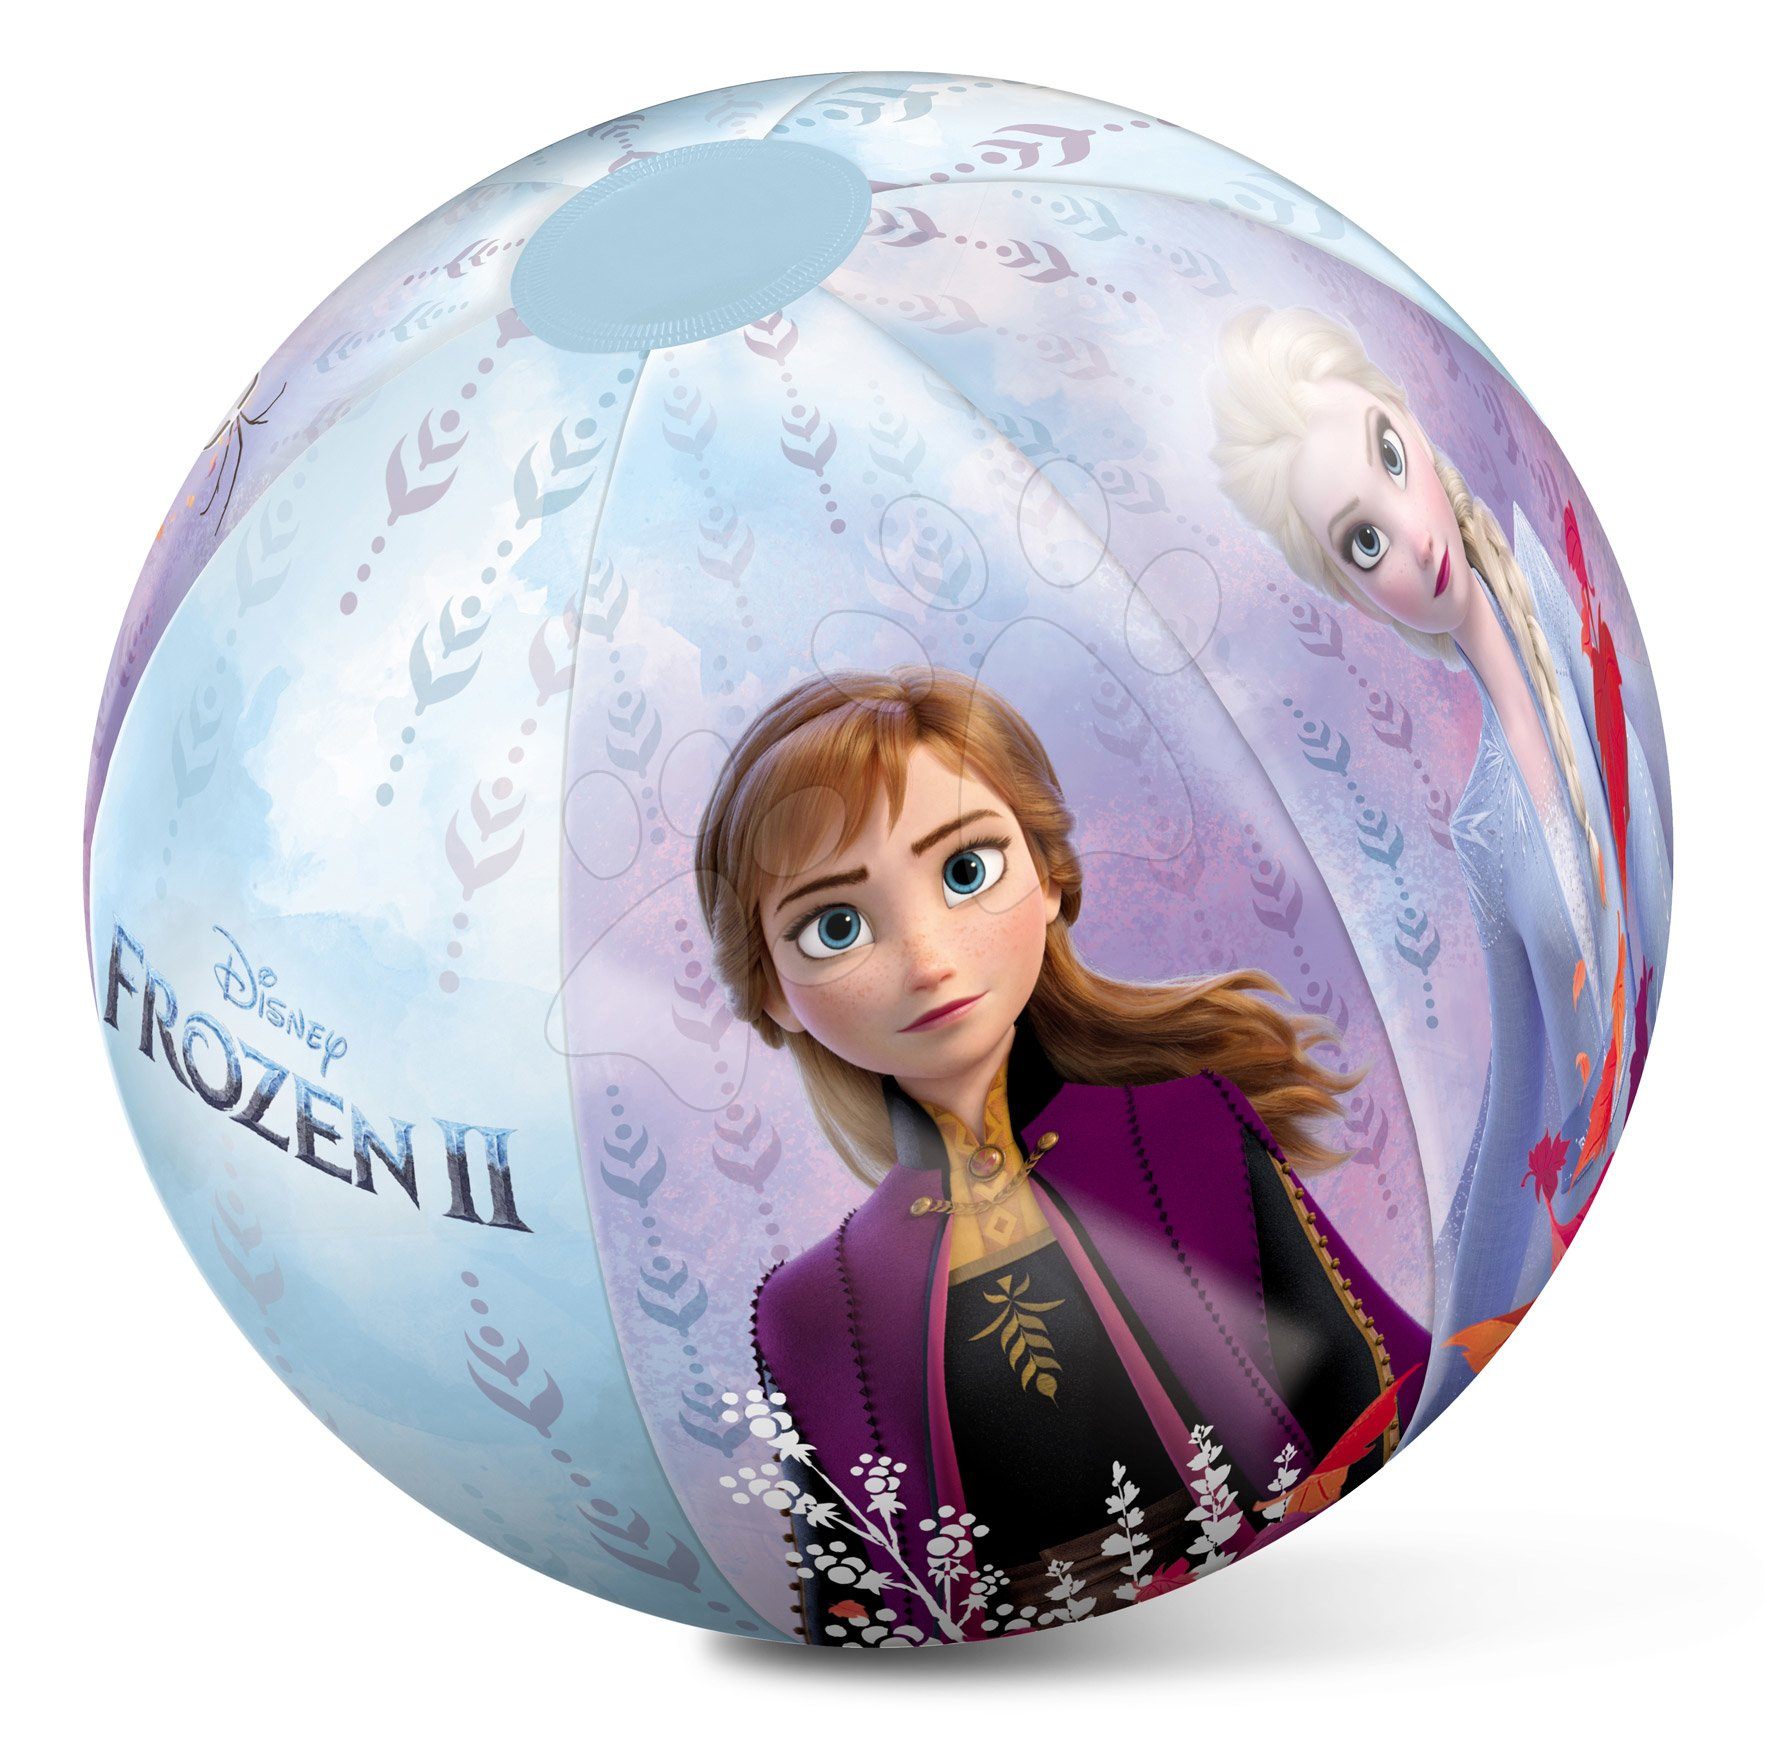 Nafukovacie lopty - Nafukovacia lopta Frozen Mondo 50 cm od 10 mes